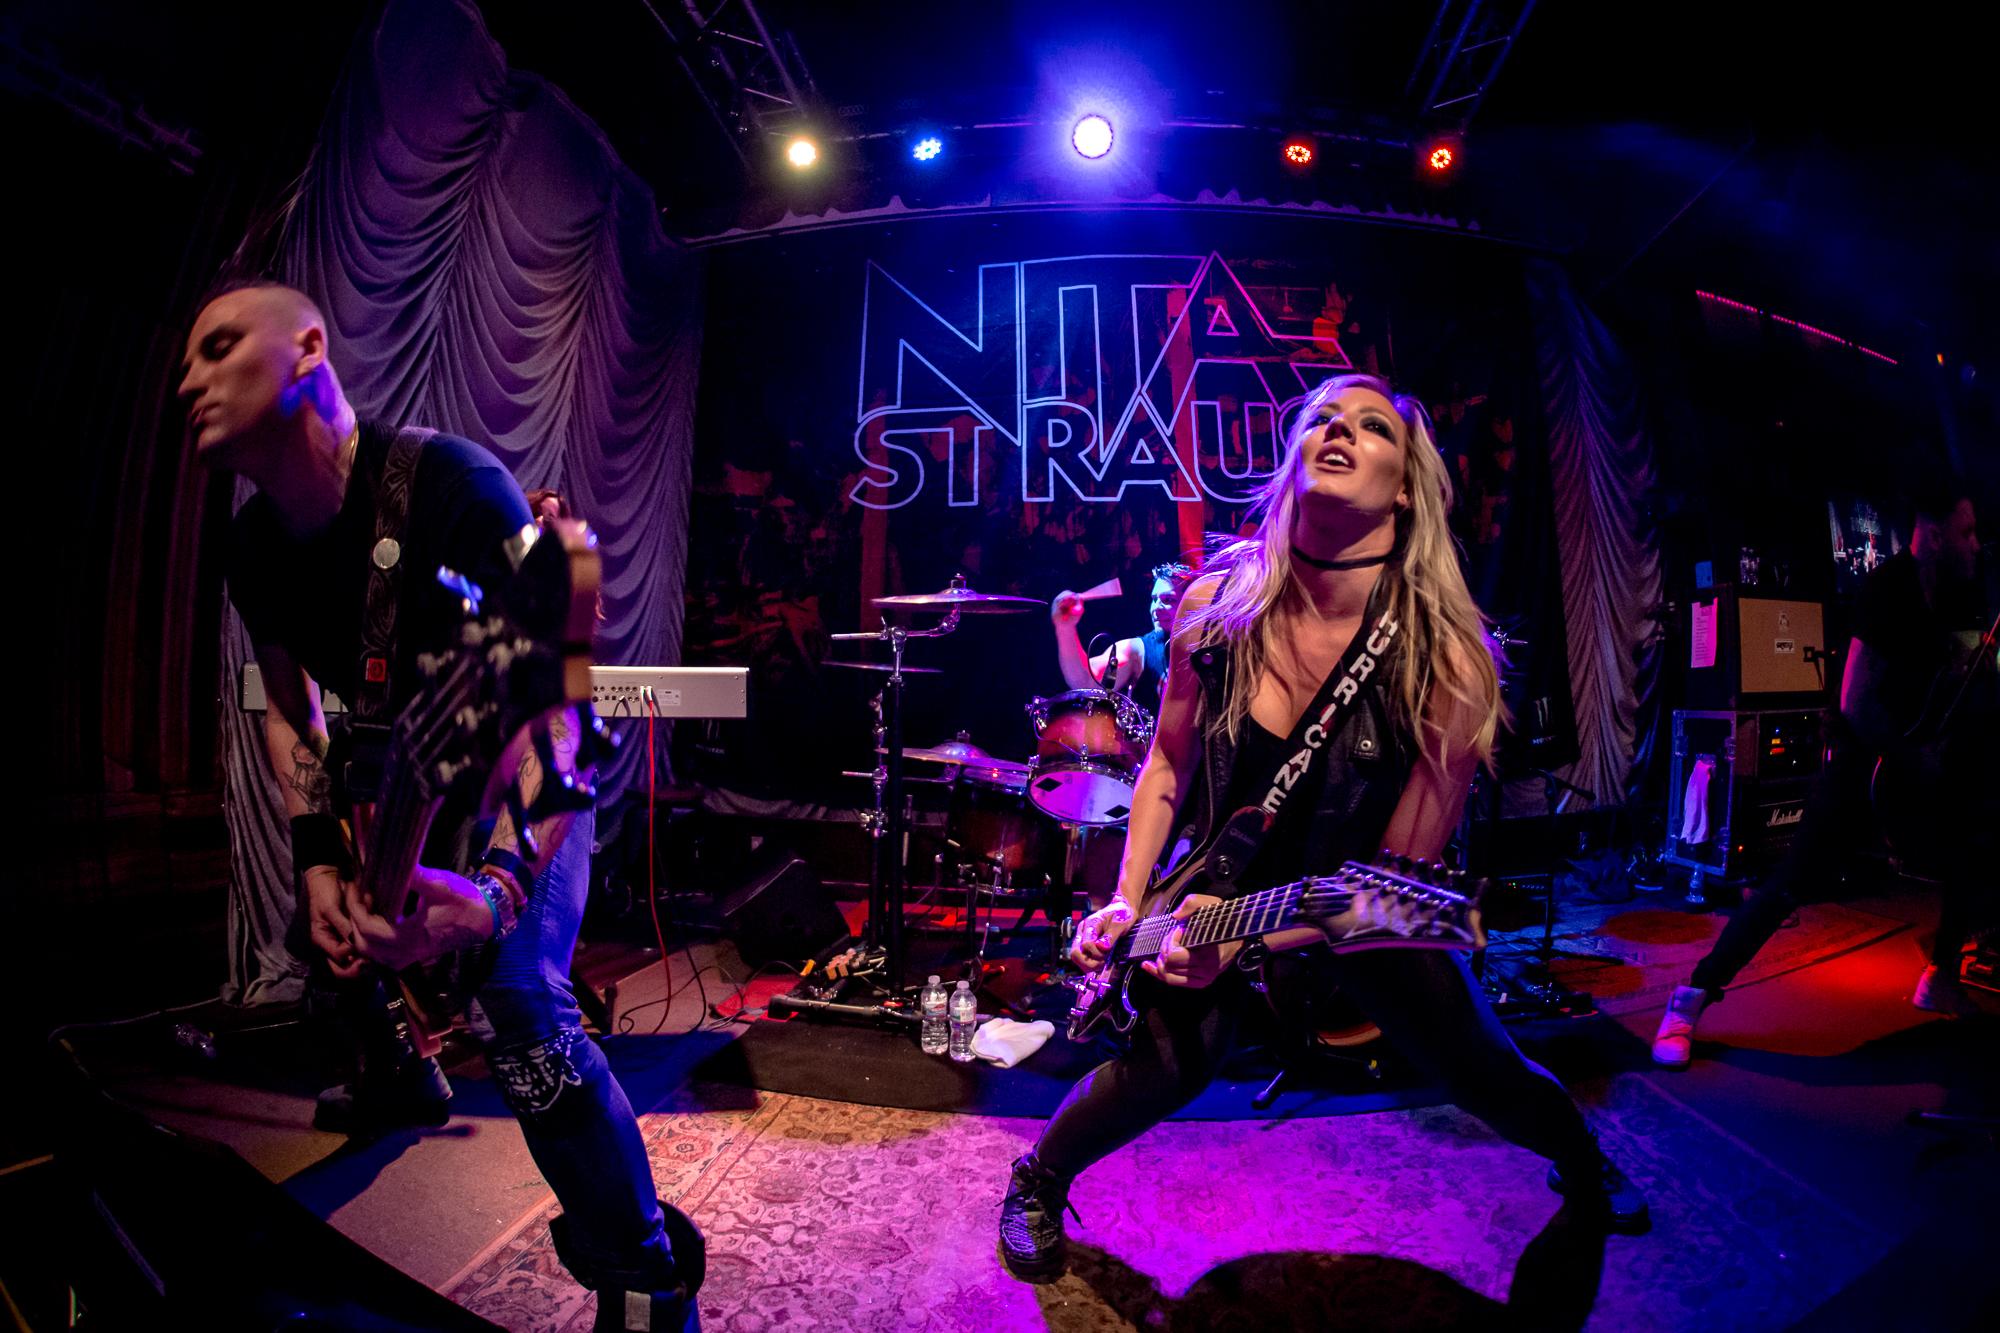 Nita Strauss_SteveRose-48.jpg